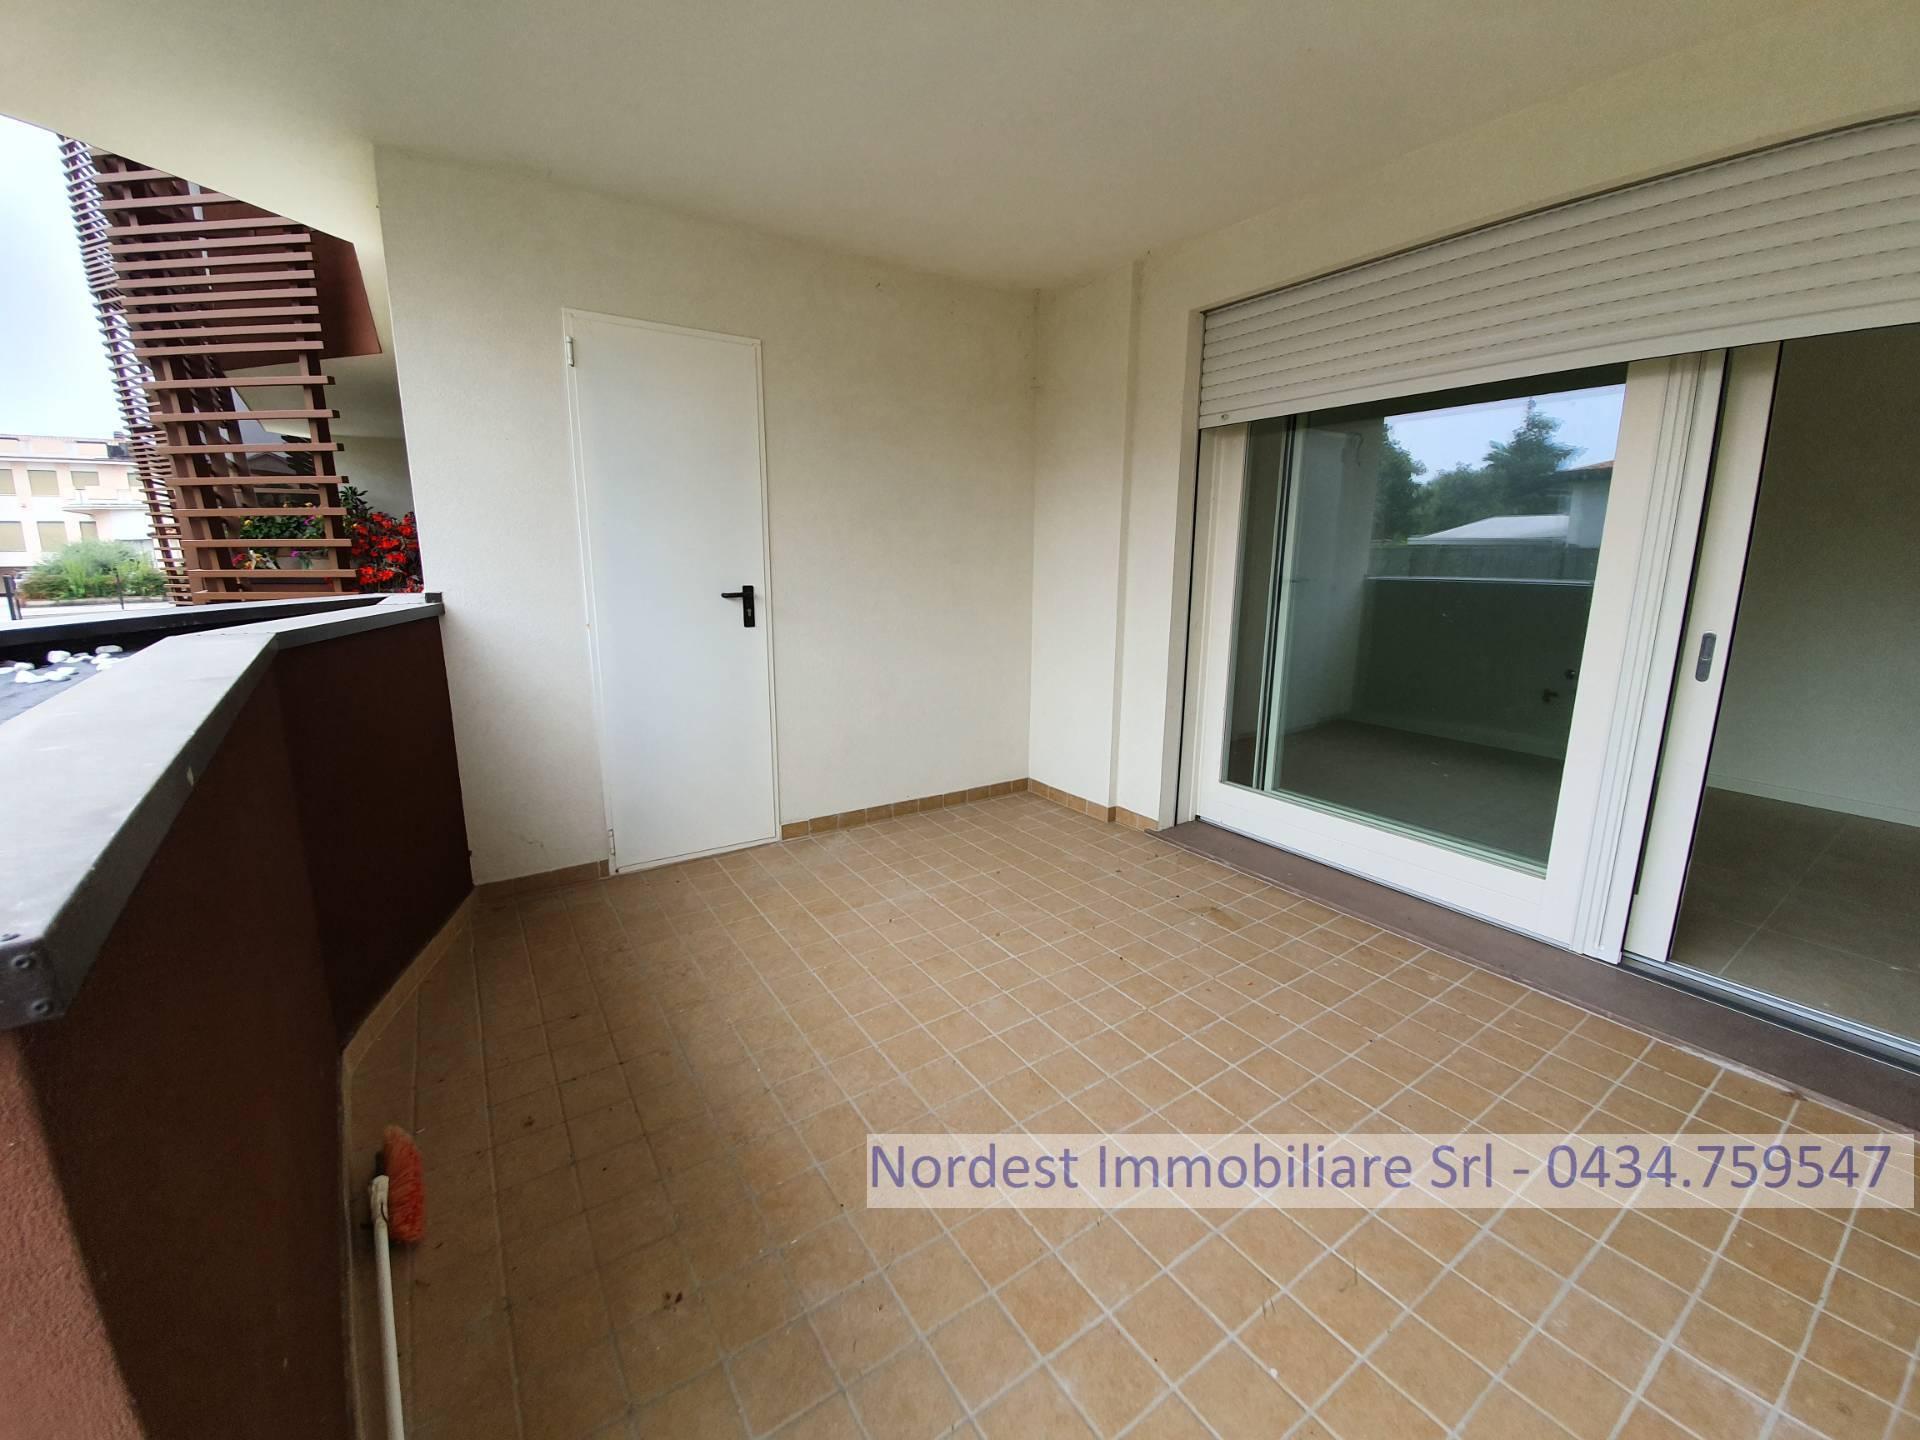 Appartamento in vendita a Brugnera, 5 locali, Trattative riservate | PortaleAgenzieImmobiliari.it